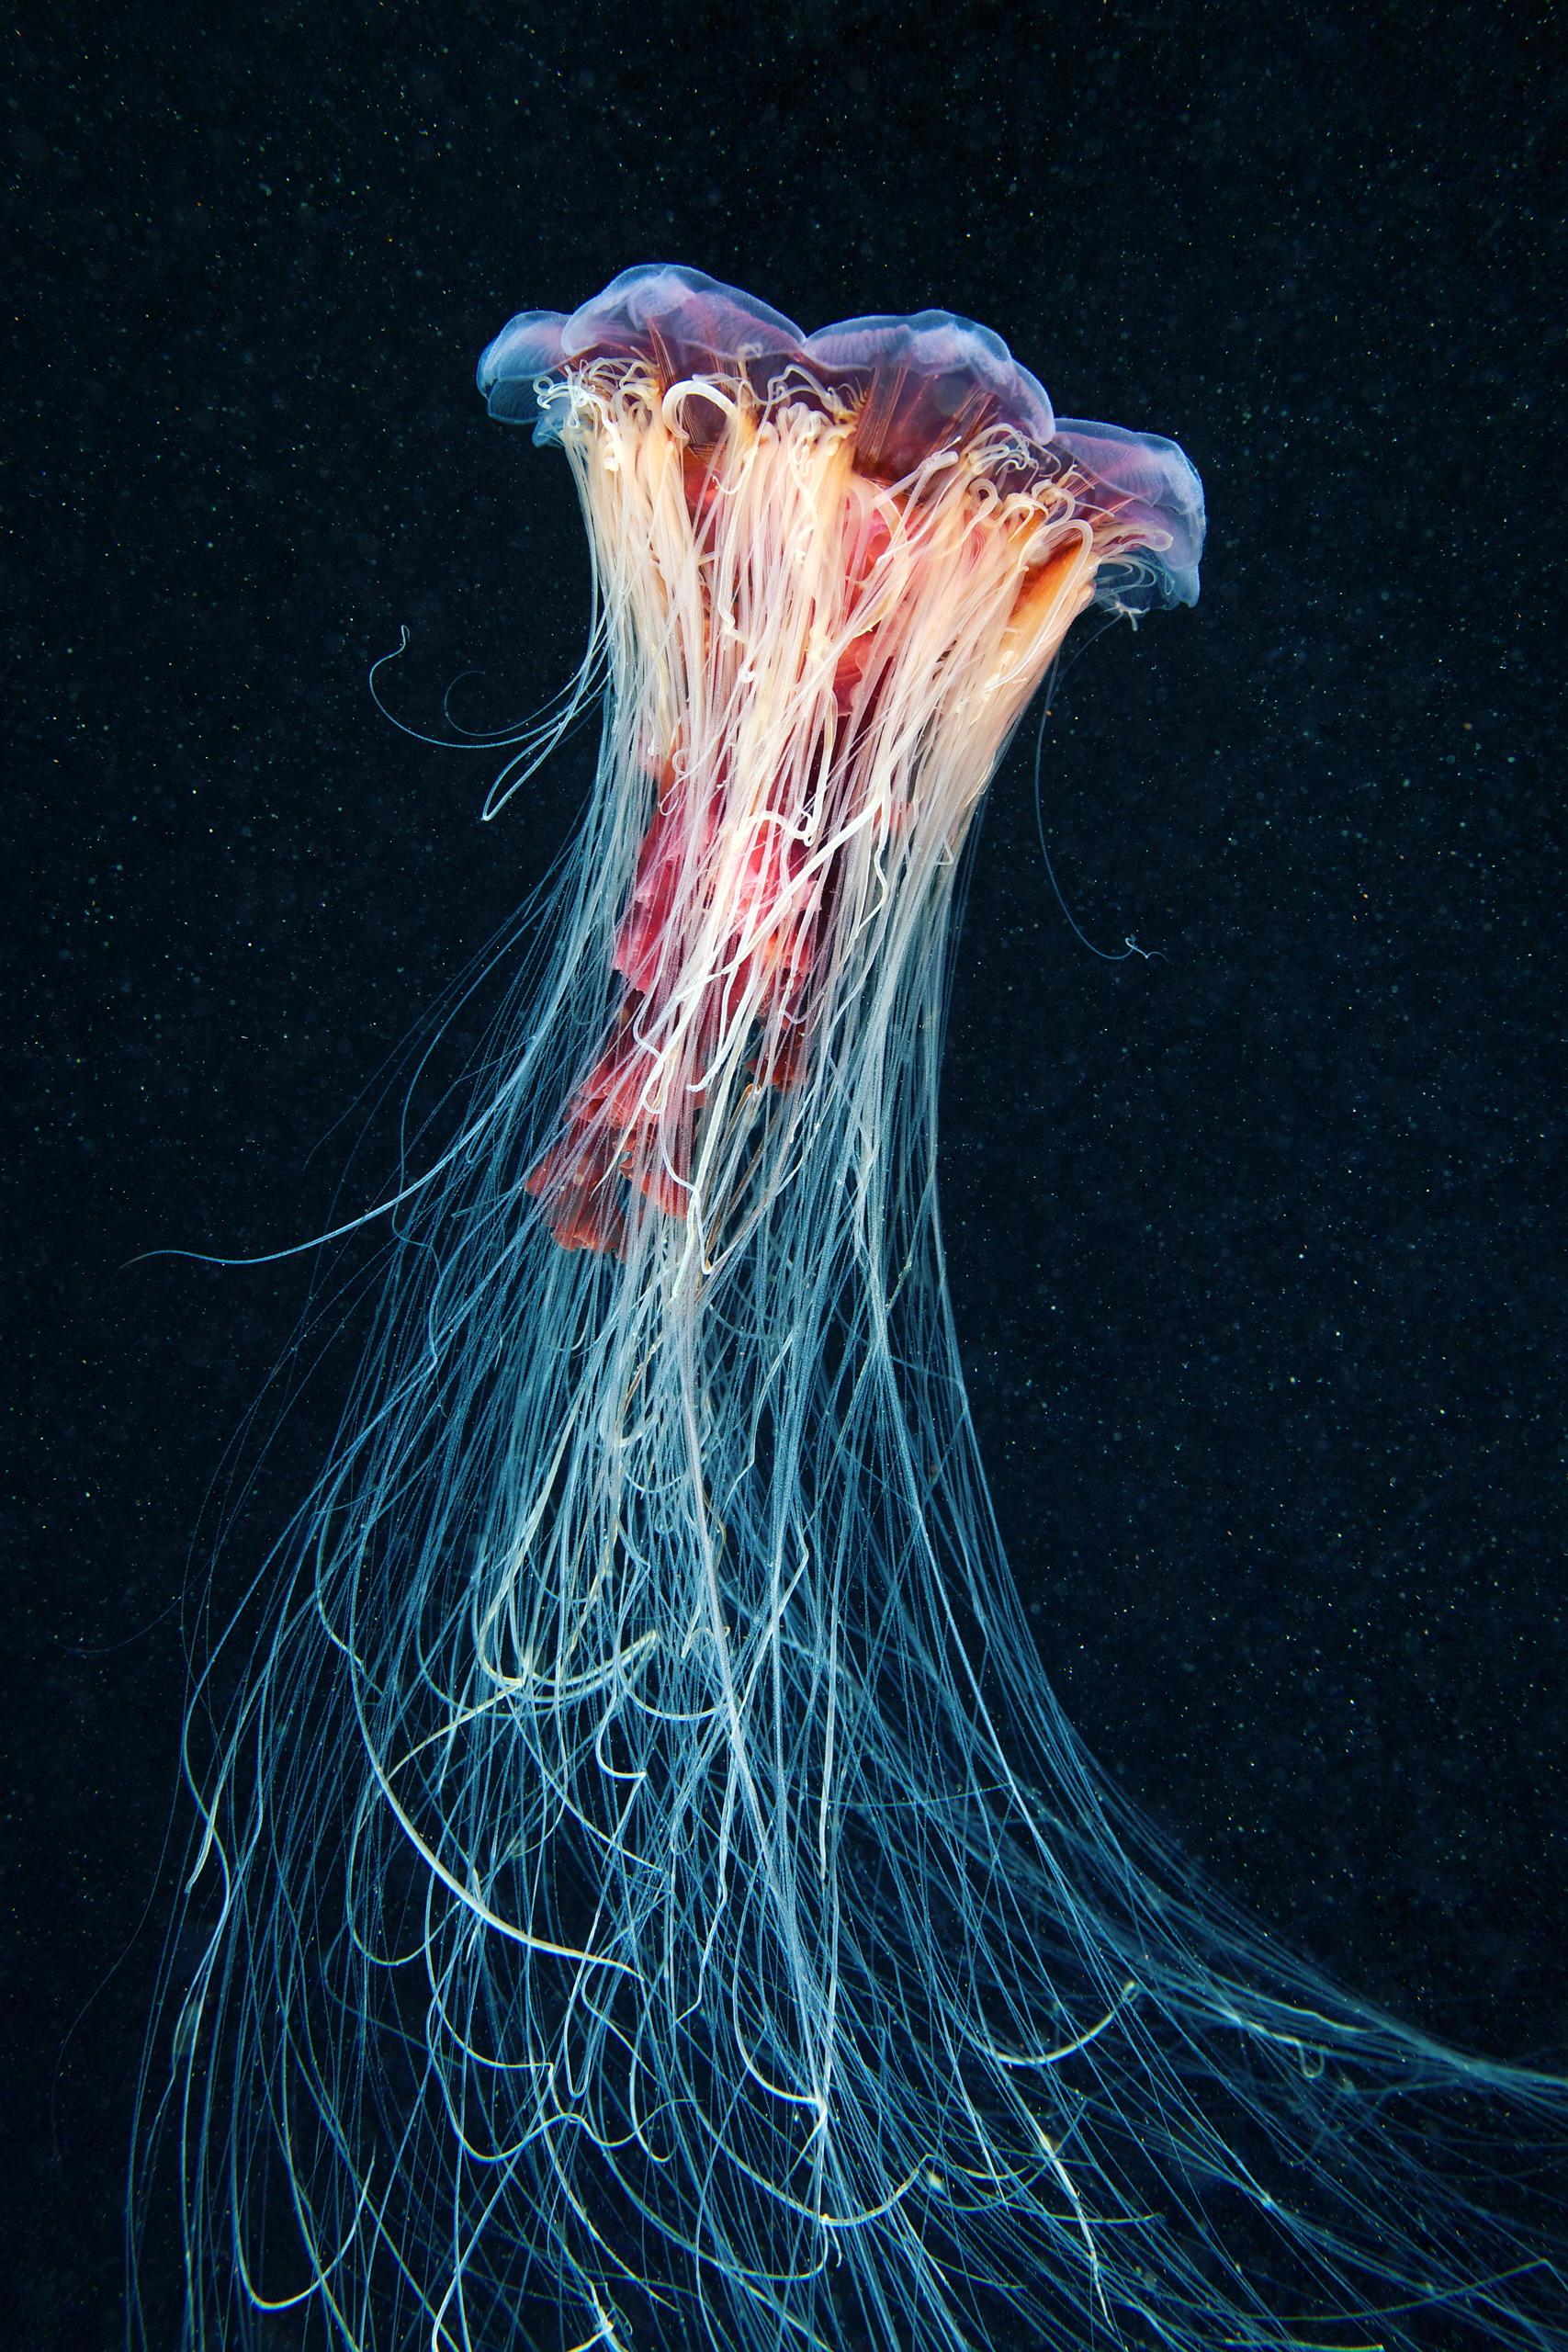 Scyphozoan jellyfish – Lion's mane jellyfish – Cyanea capillata 03